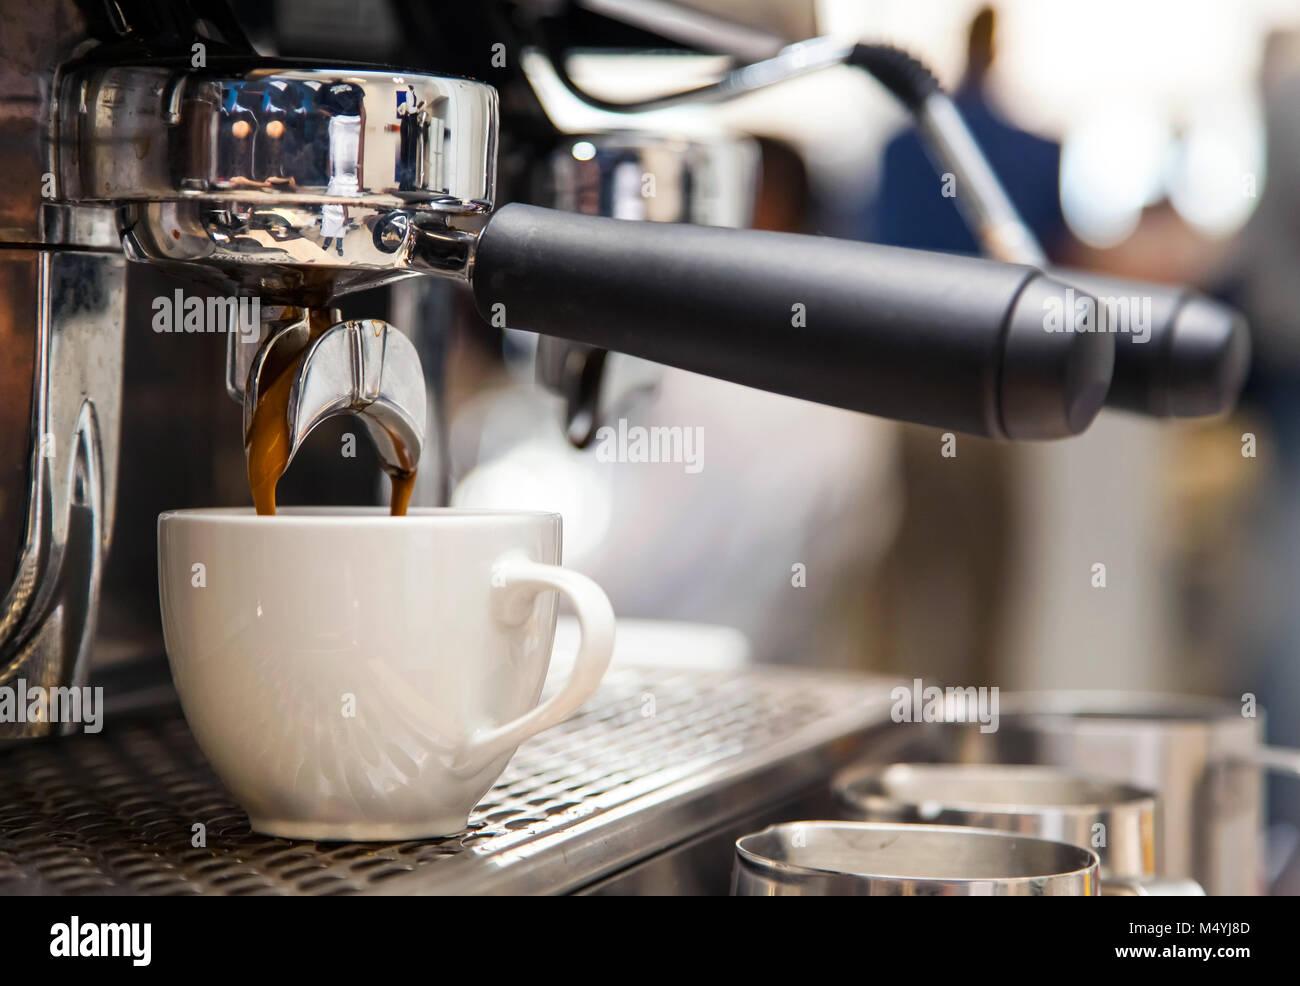 Cerca del café en taza de barista, la máquina de café. Americano. Foto de stock